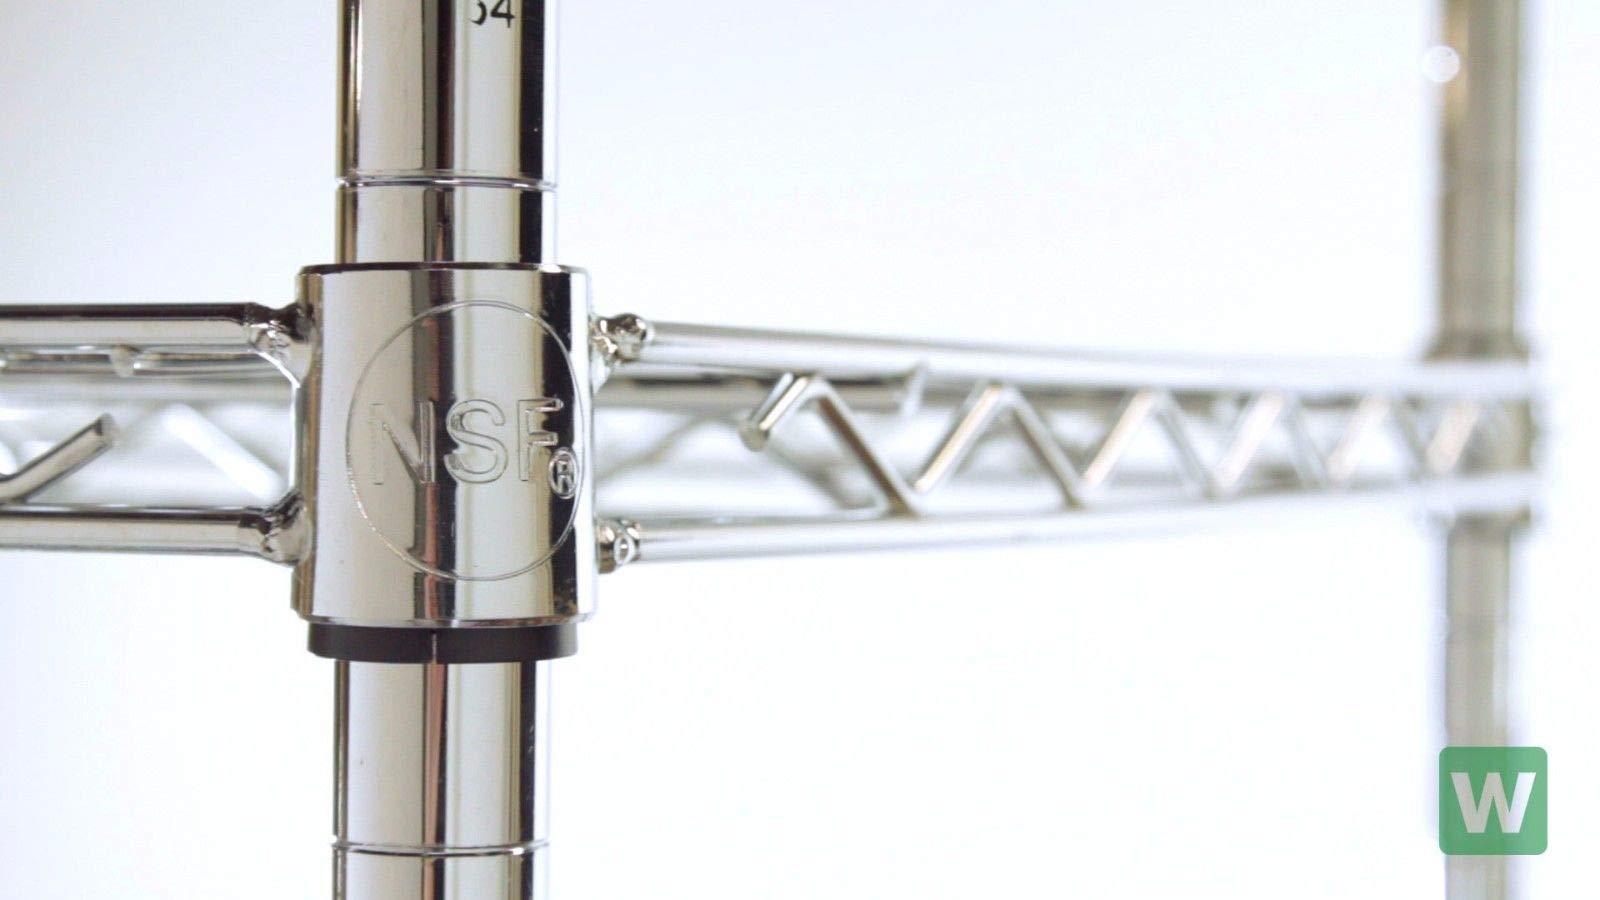 LJ Commercial Chrome Wire Unit 14 x 42-2 Shelf Unit - 14'' Height by LJ